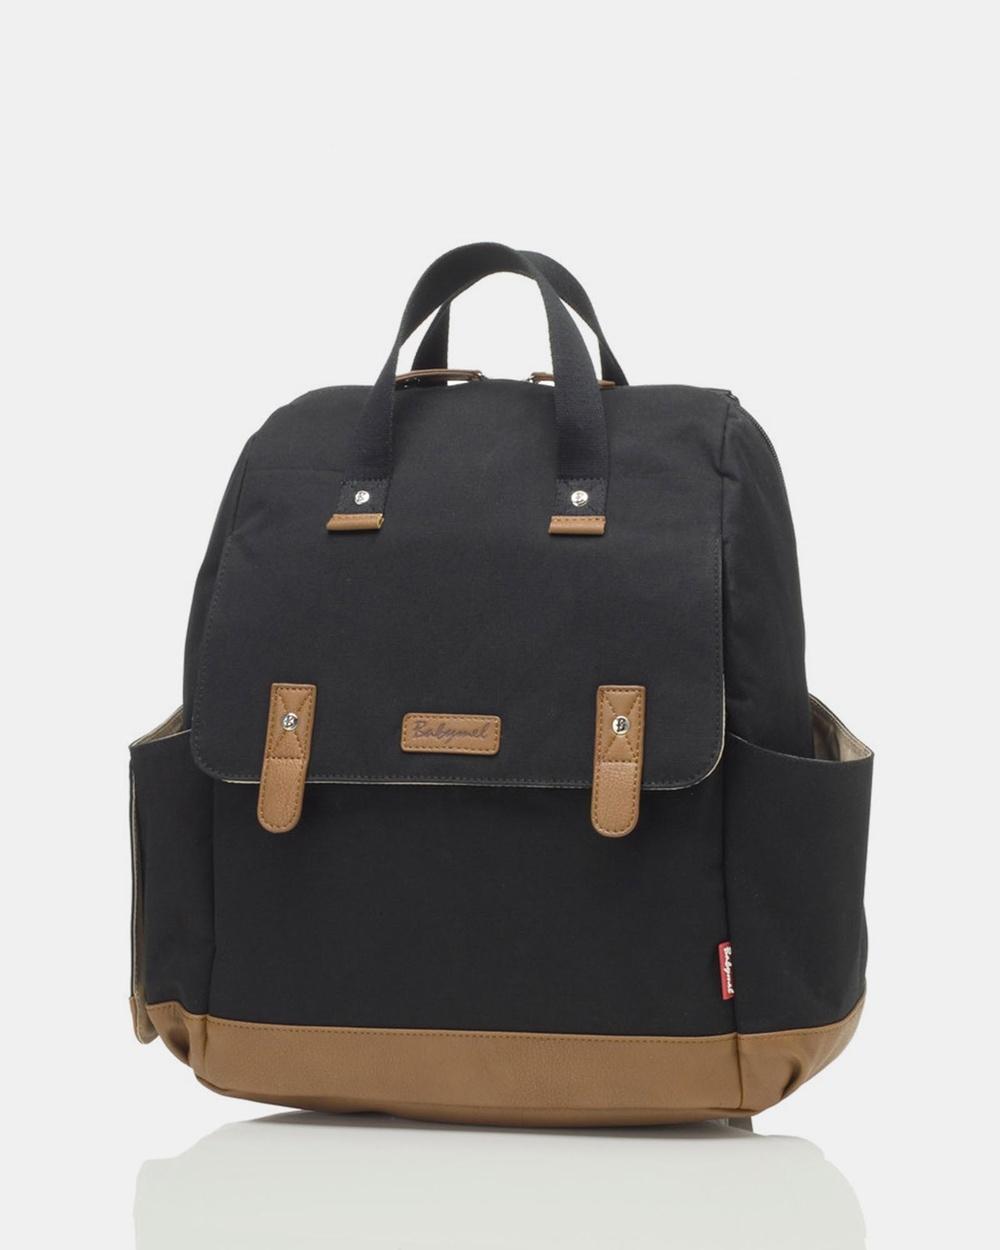 Babymel Robyn Convertible Backpack Nappy Bag Backpacks Black